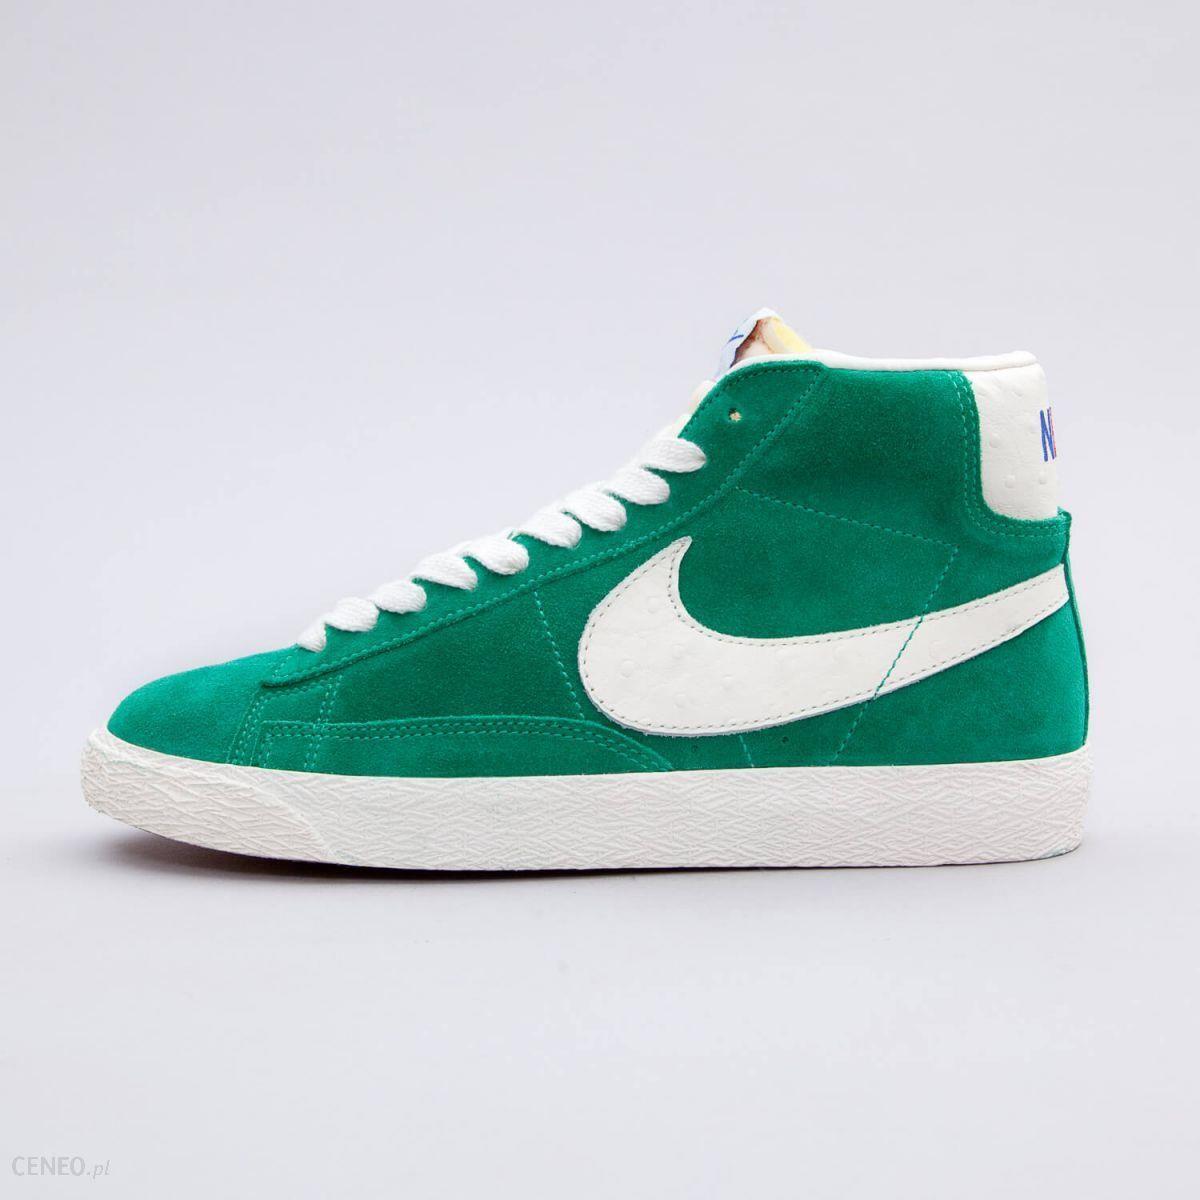 654ee8ff Nike BLAZER VINTAGE GREEN 638322-300 - Ceny i opinie - Ceneo.pl